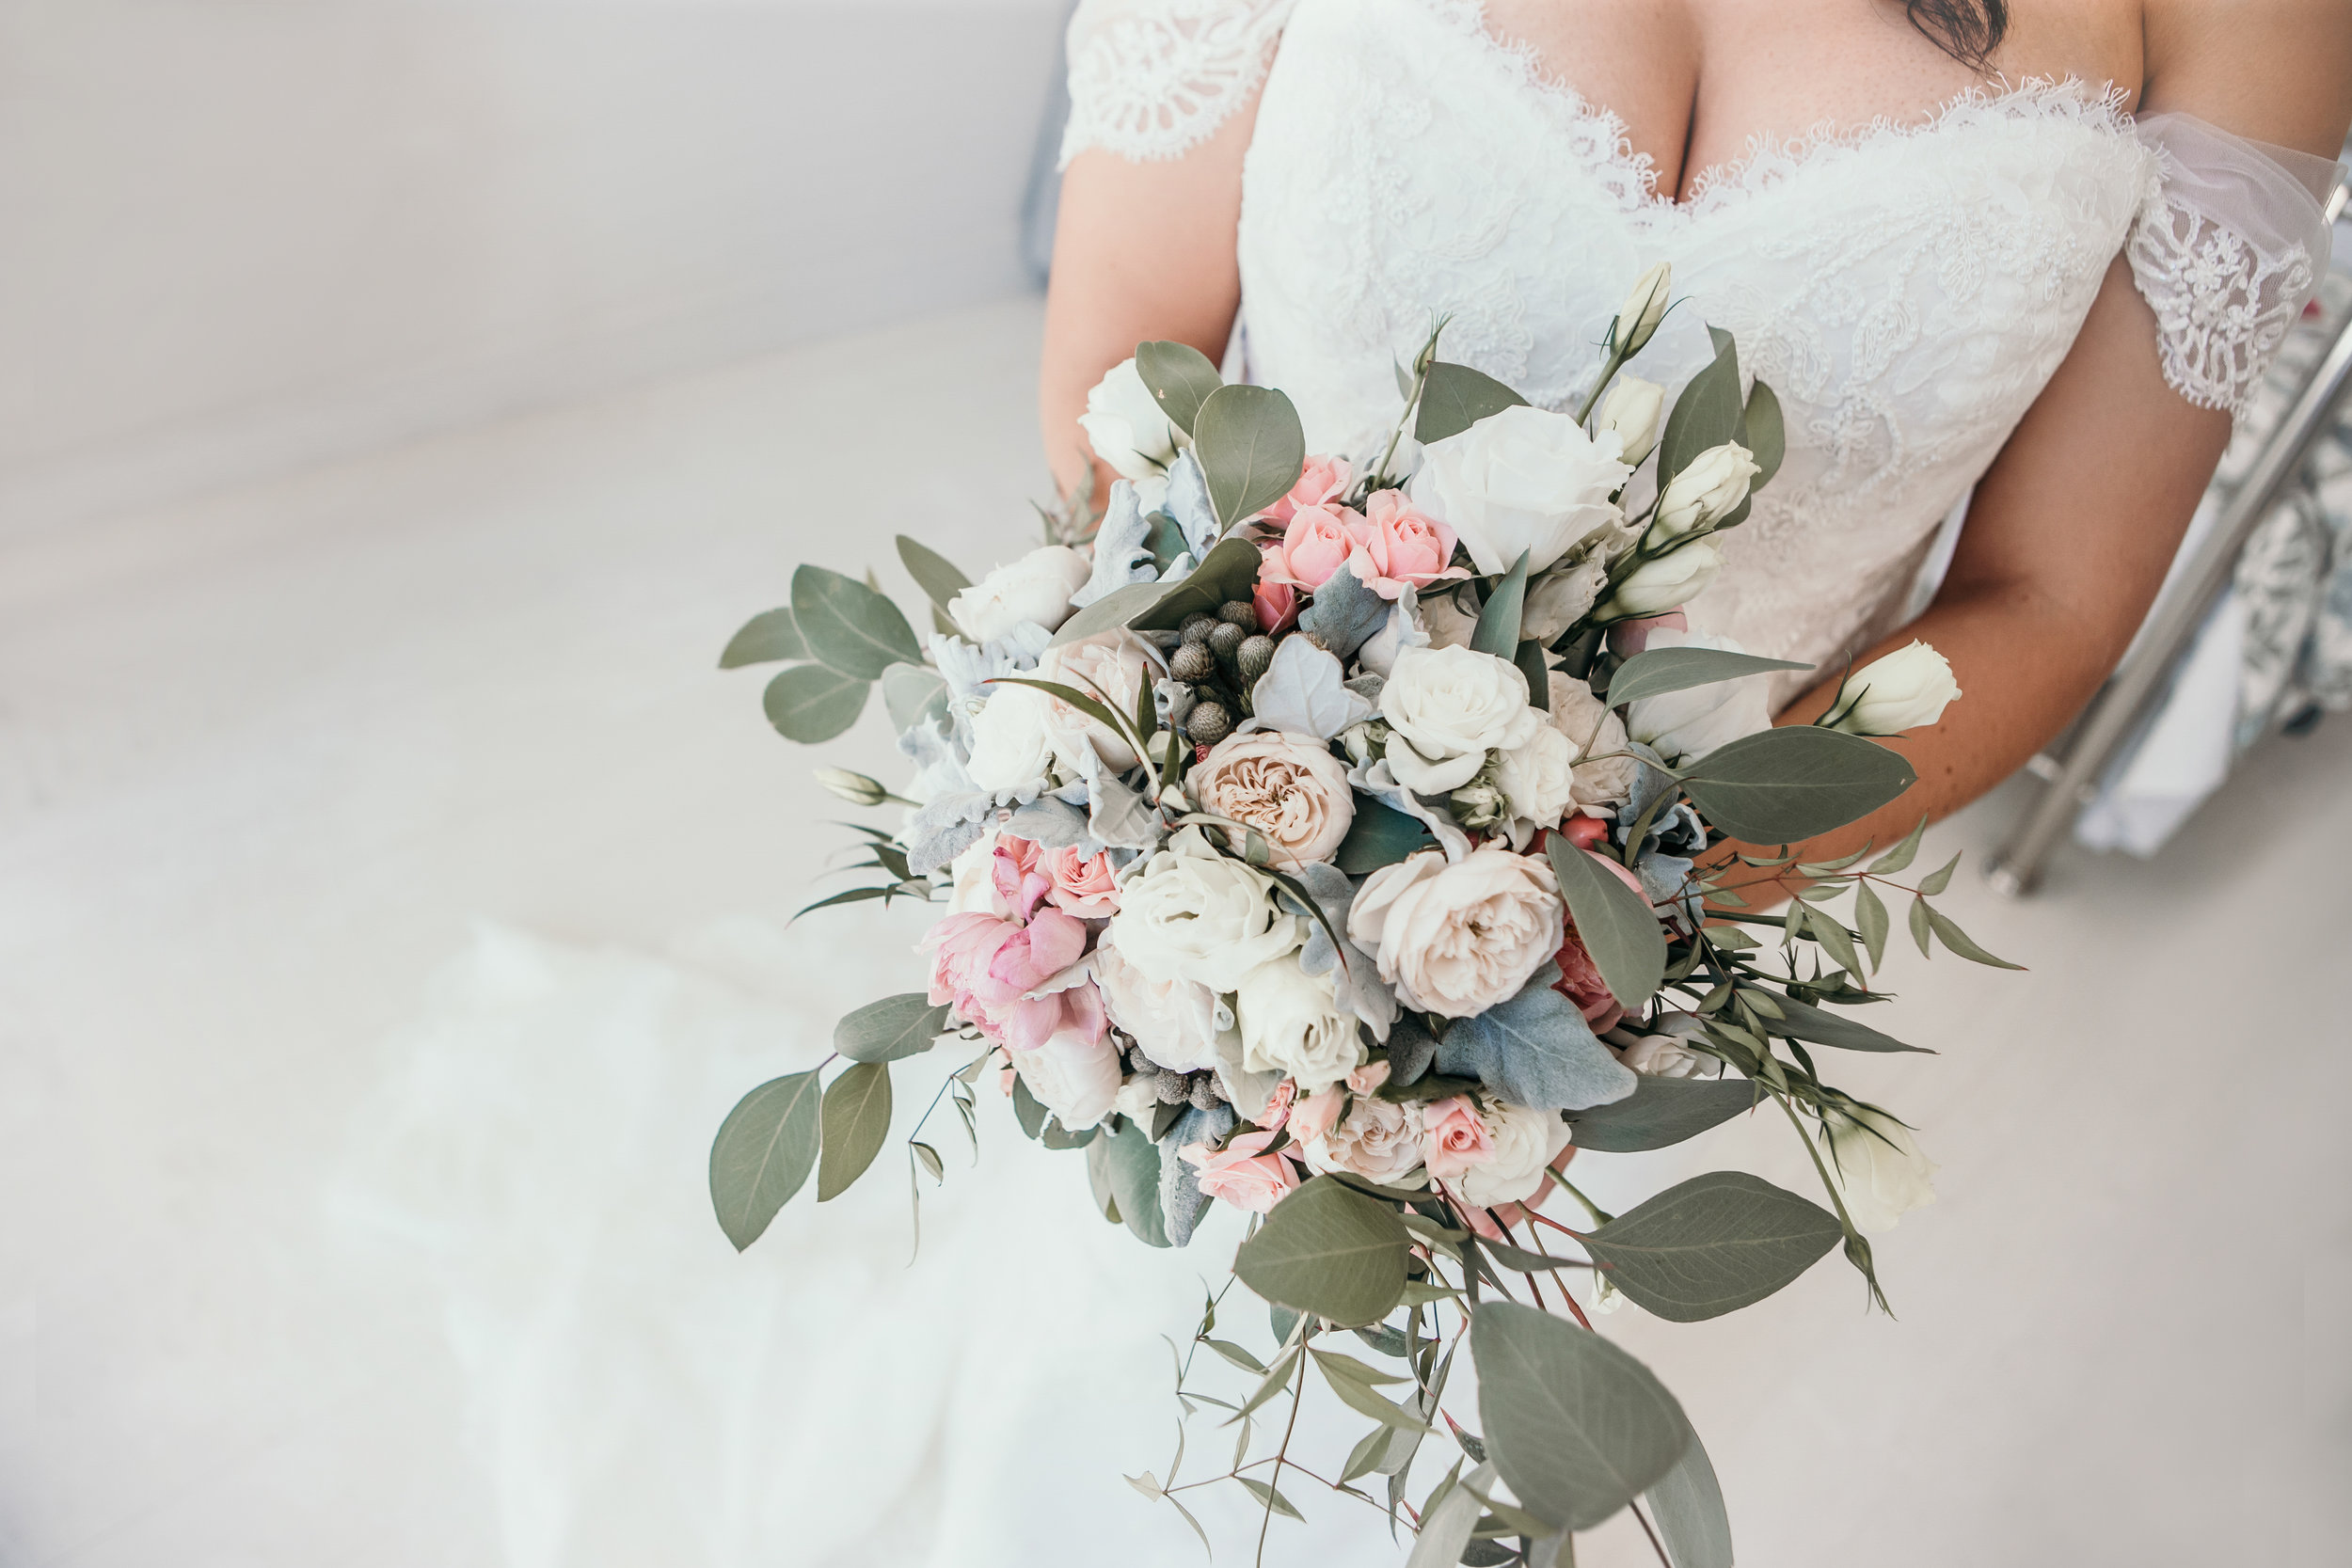 clare's bouquet.JPG